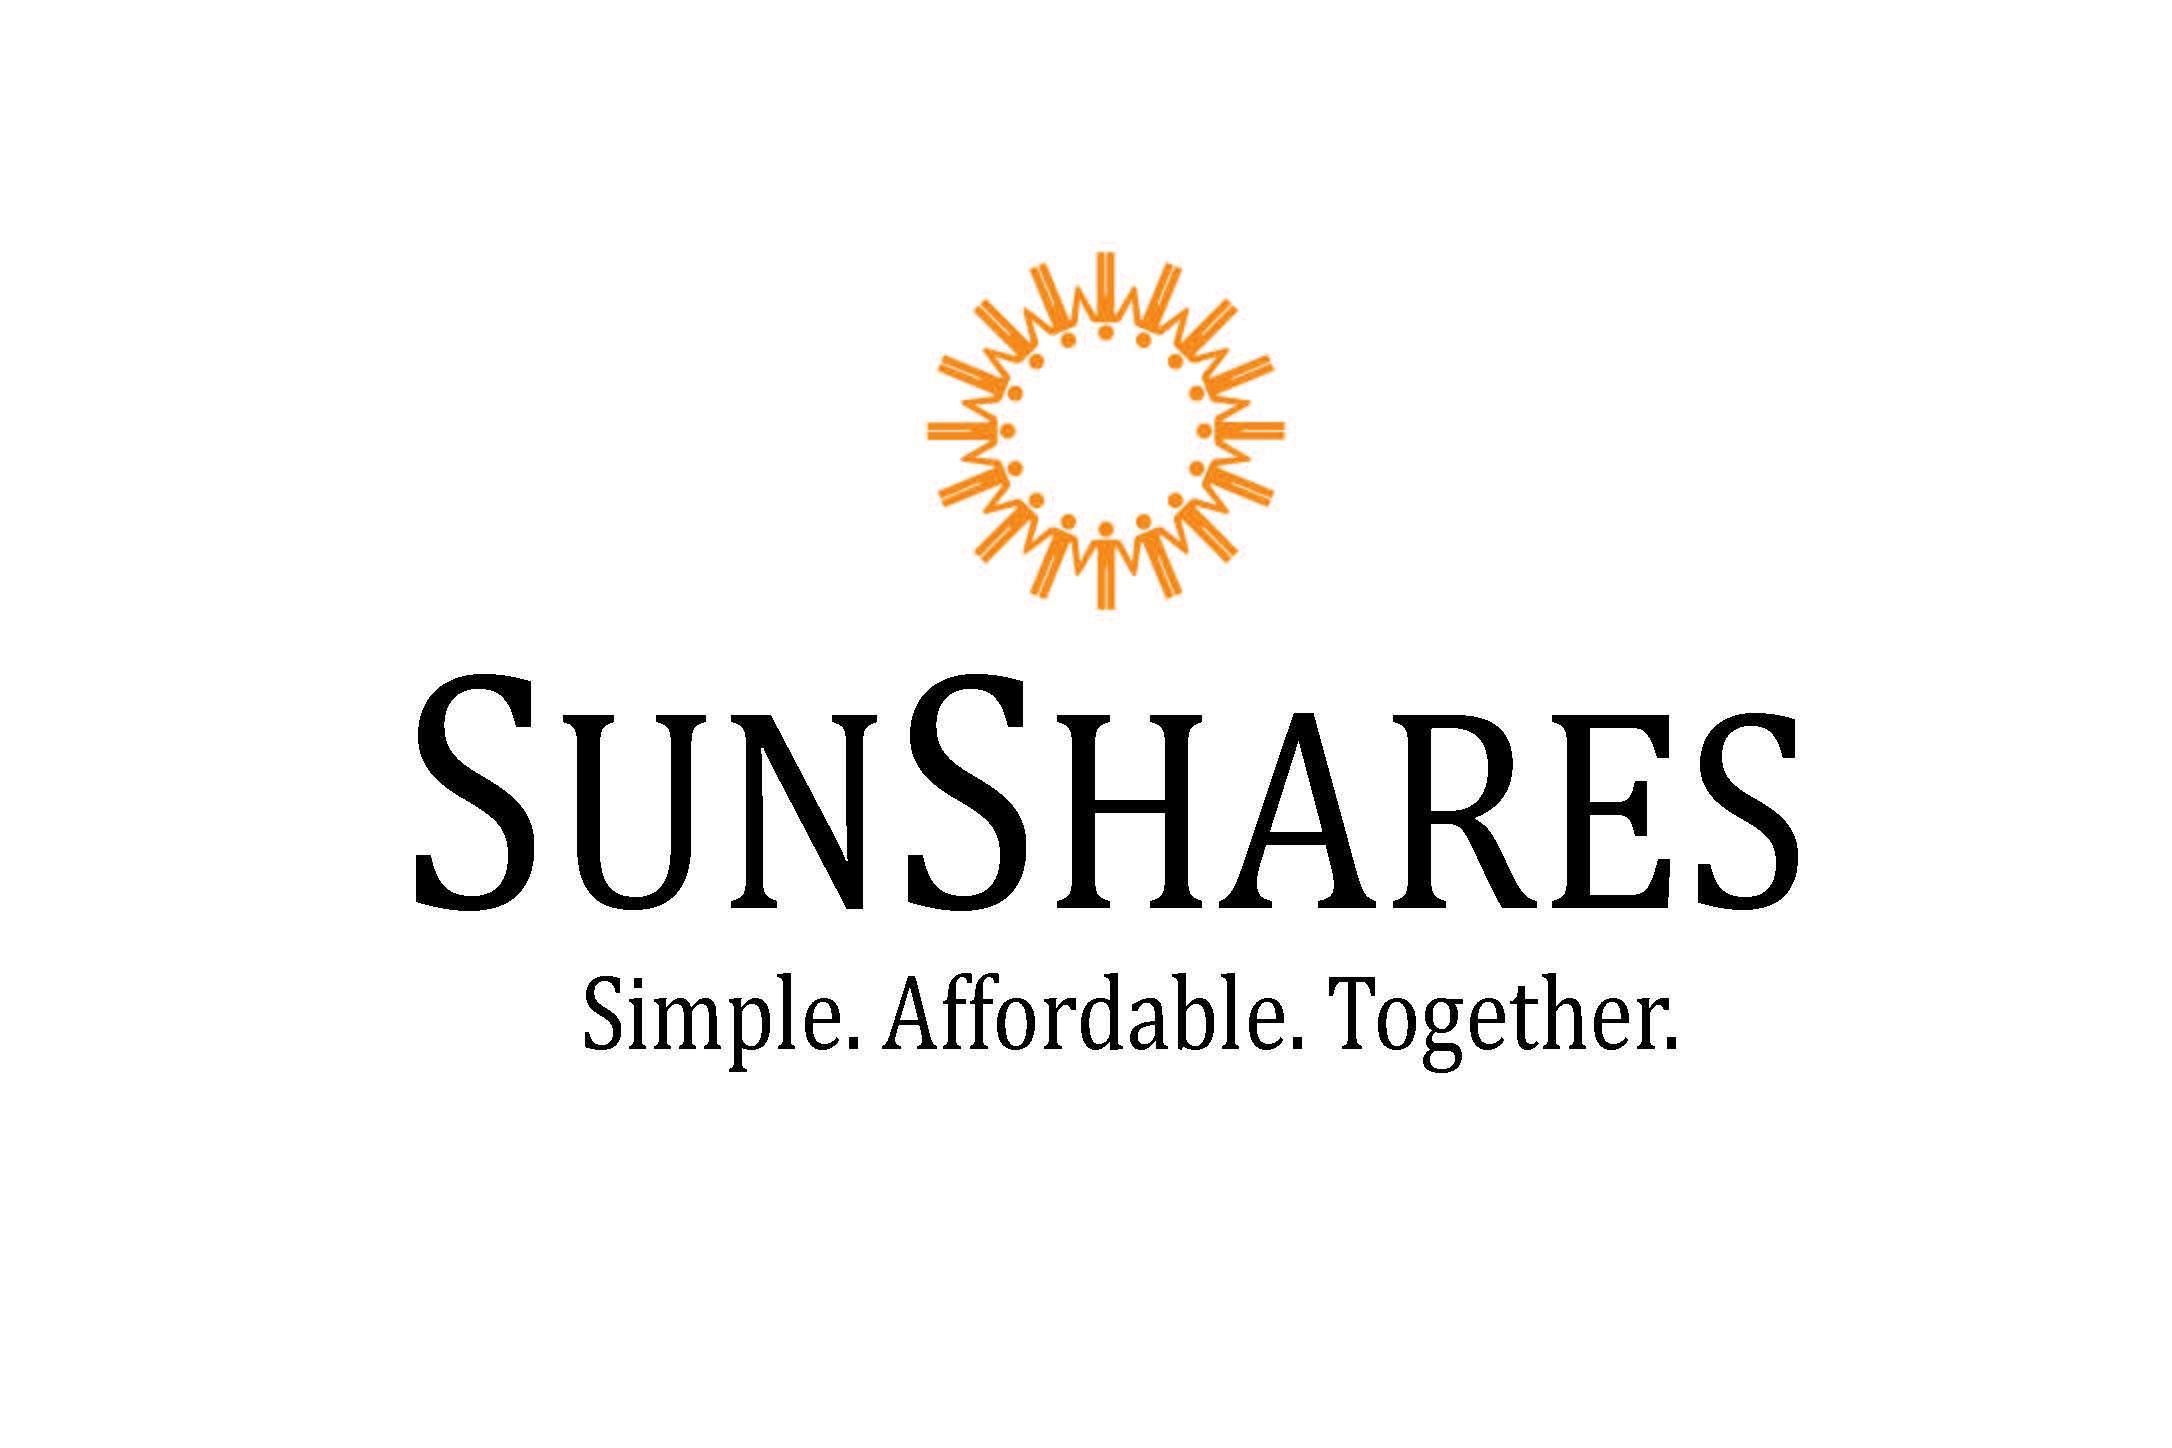 Bay Area SunShares - Workday Workshop